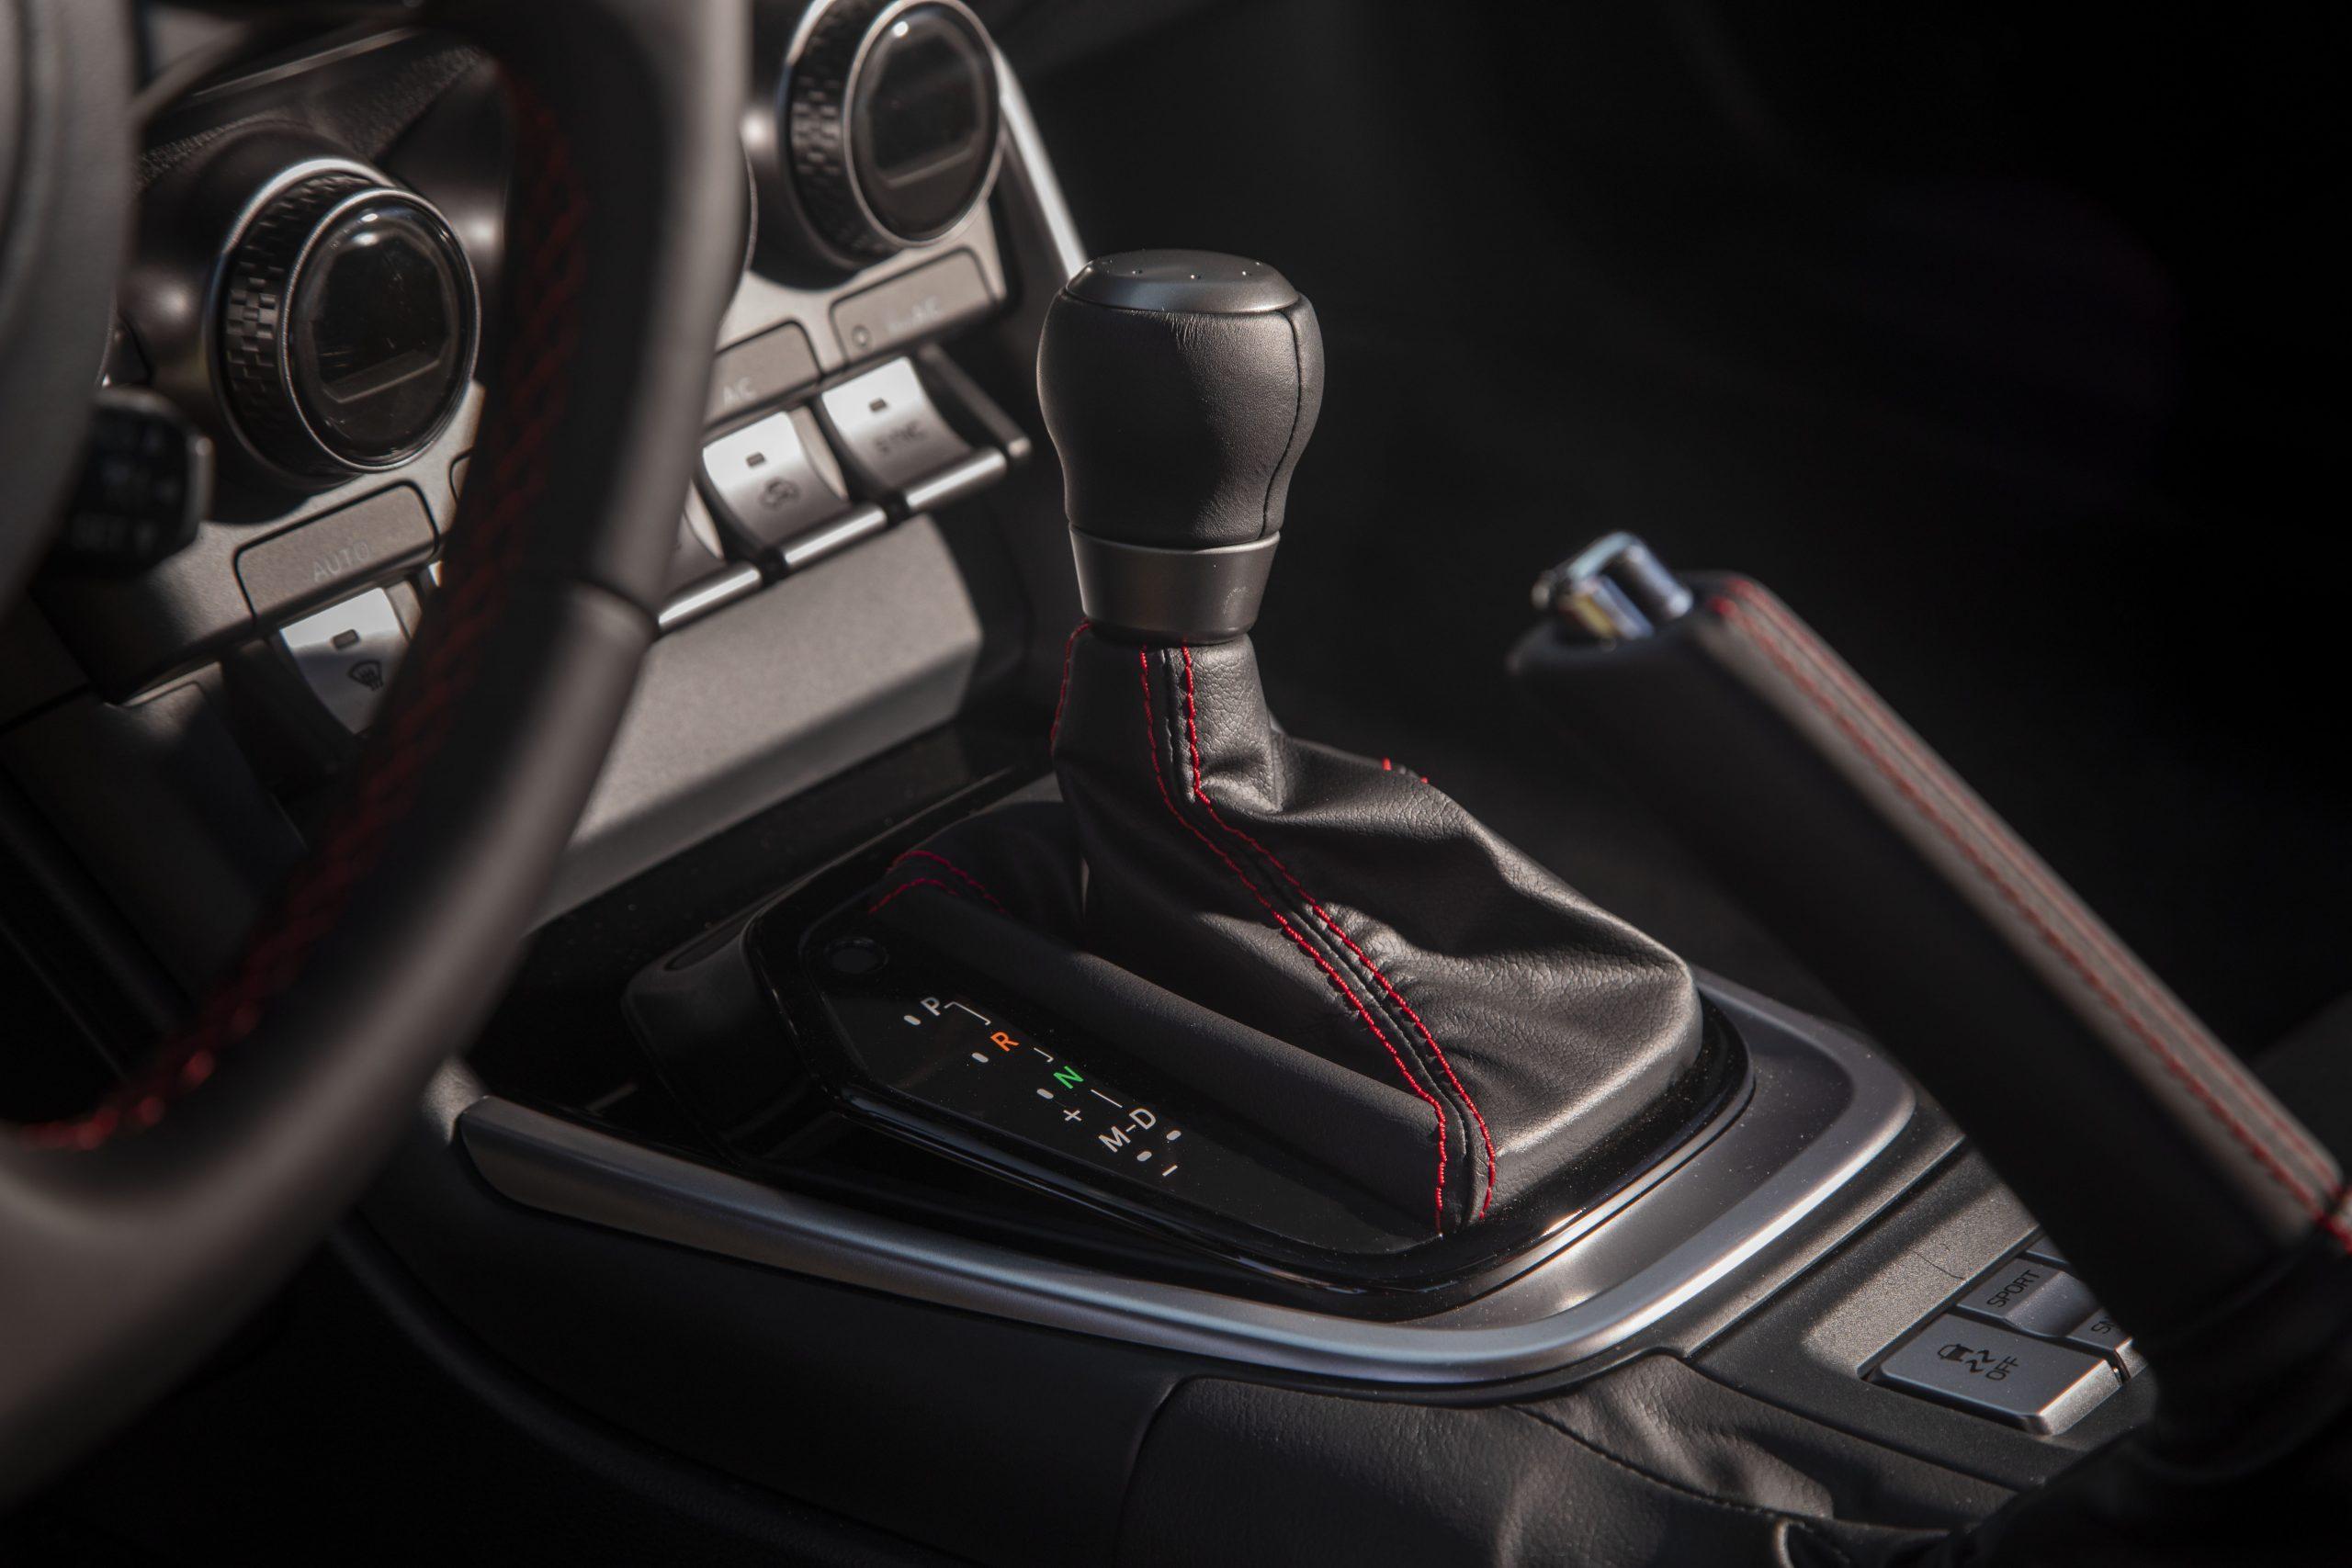 2022 Subaru BRZ interior shifter detail